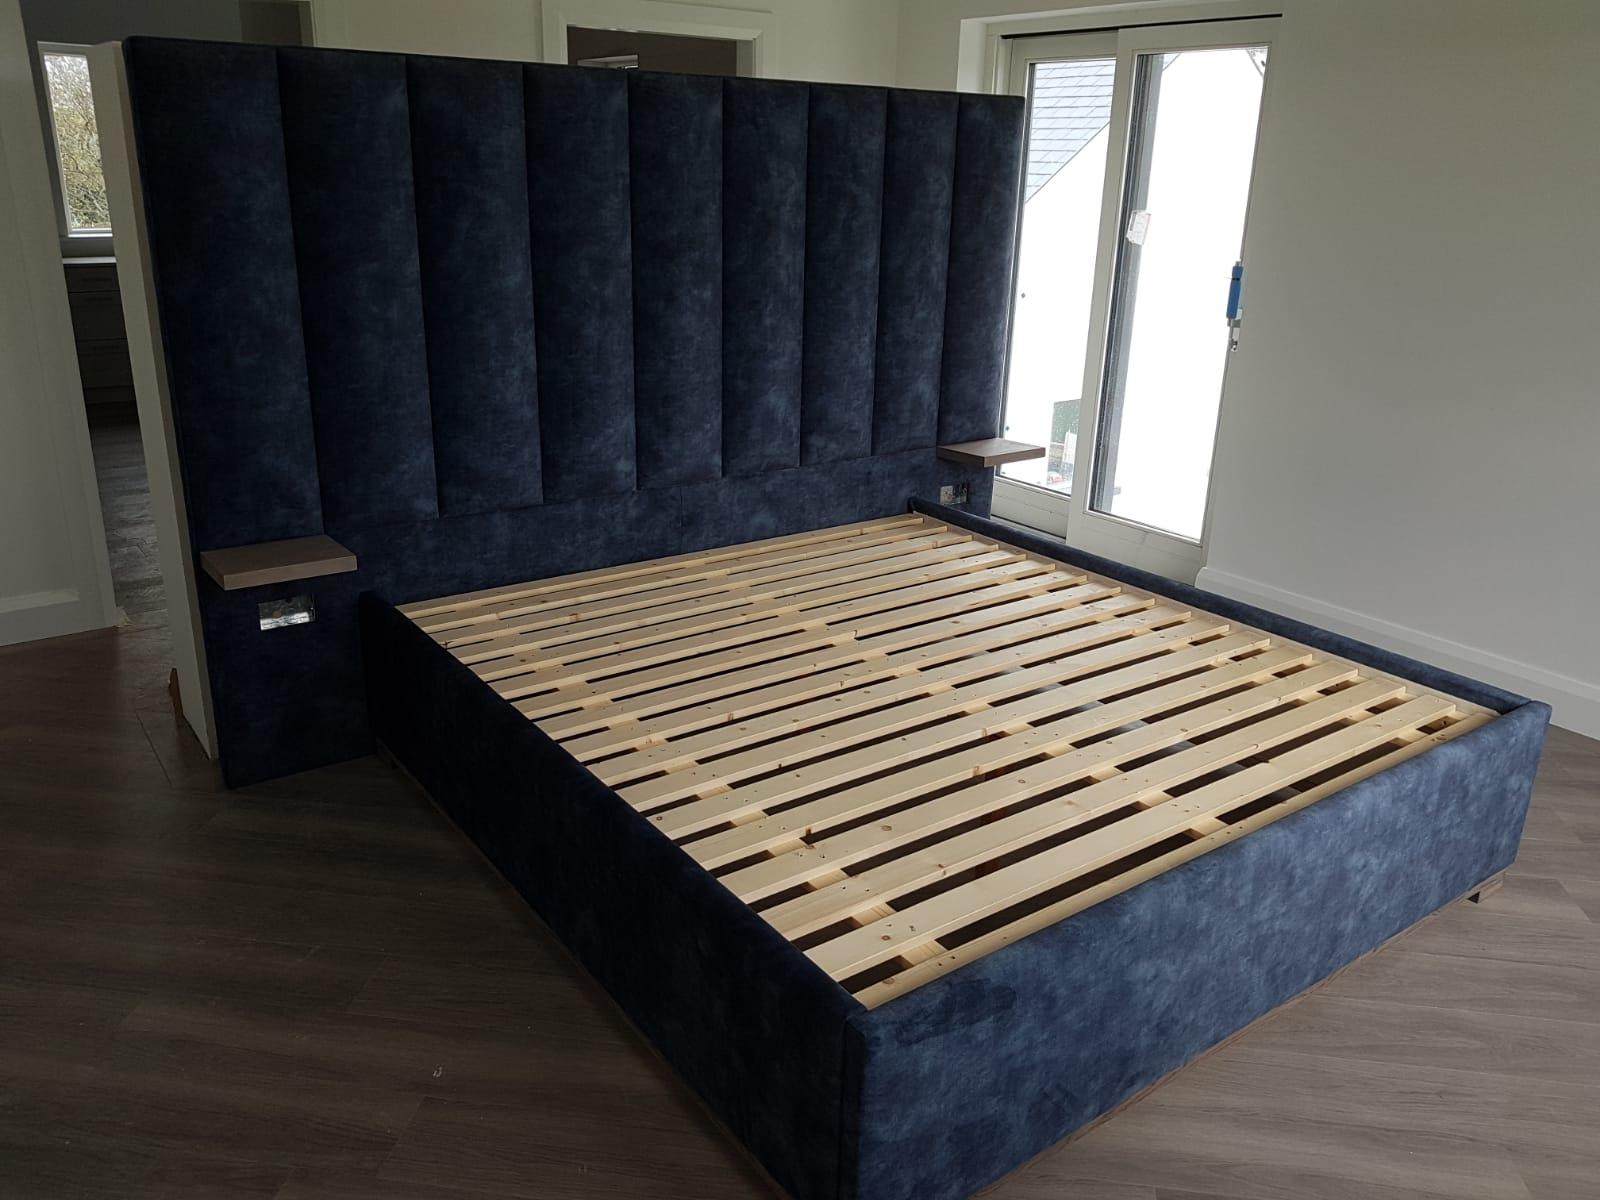 backboard of sofa